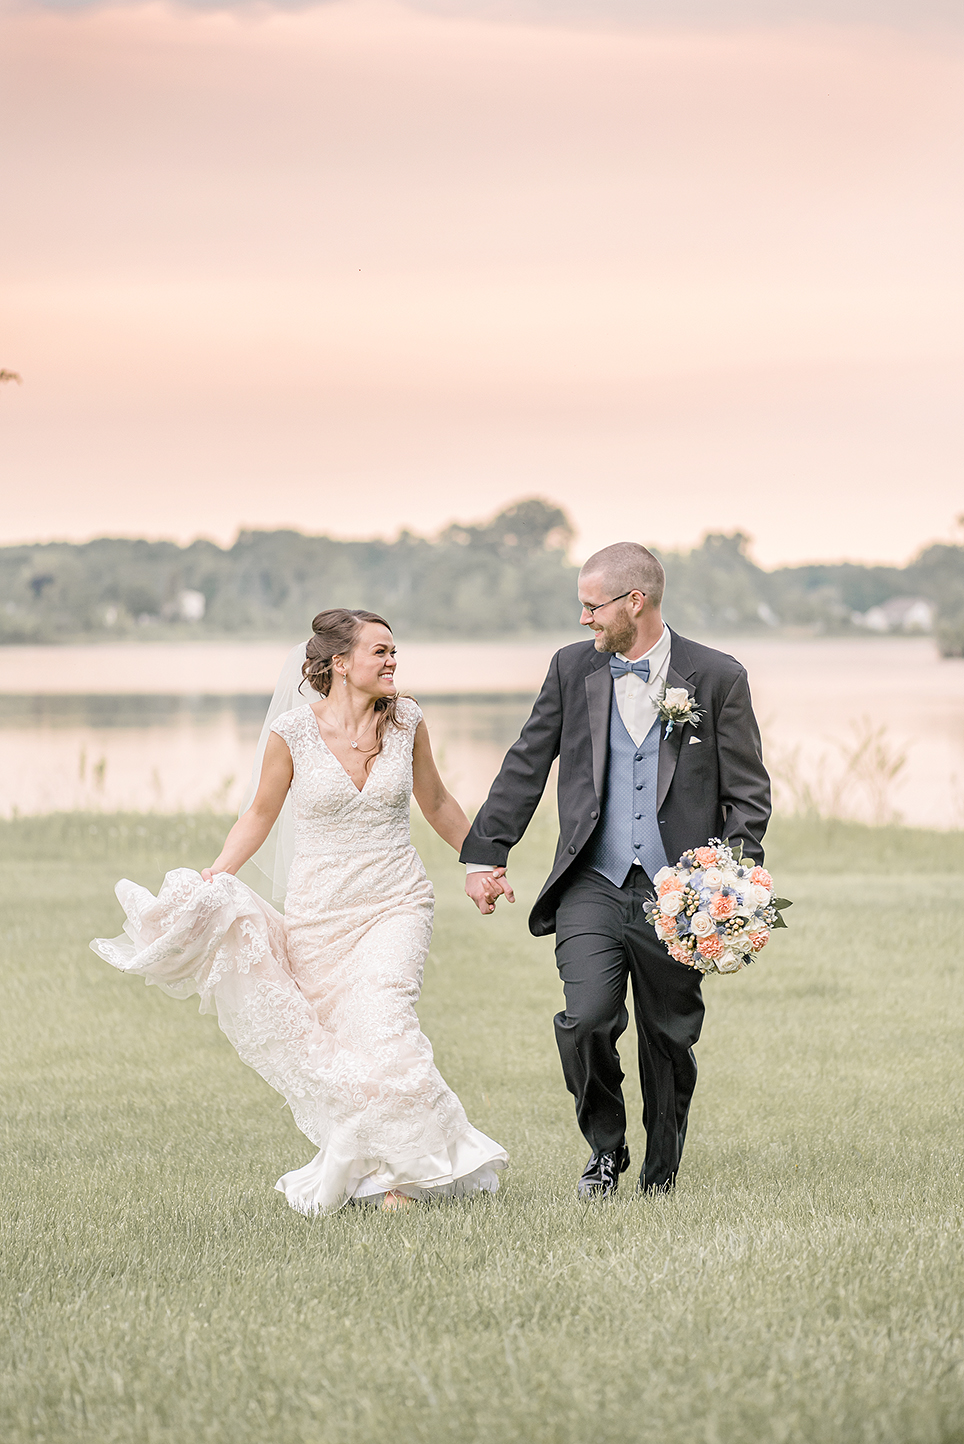 LINDSAY-ADKINS-PHOTOGRAPHY-MICHIGAN-WEDDING-PHOTOGRAPHER-SAUK-VALLEY-RESORT-WEDDING